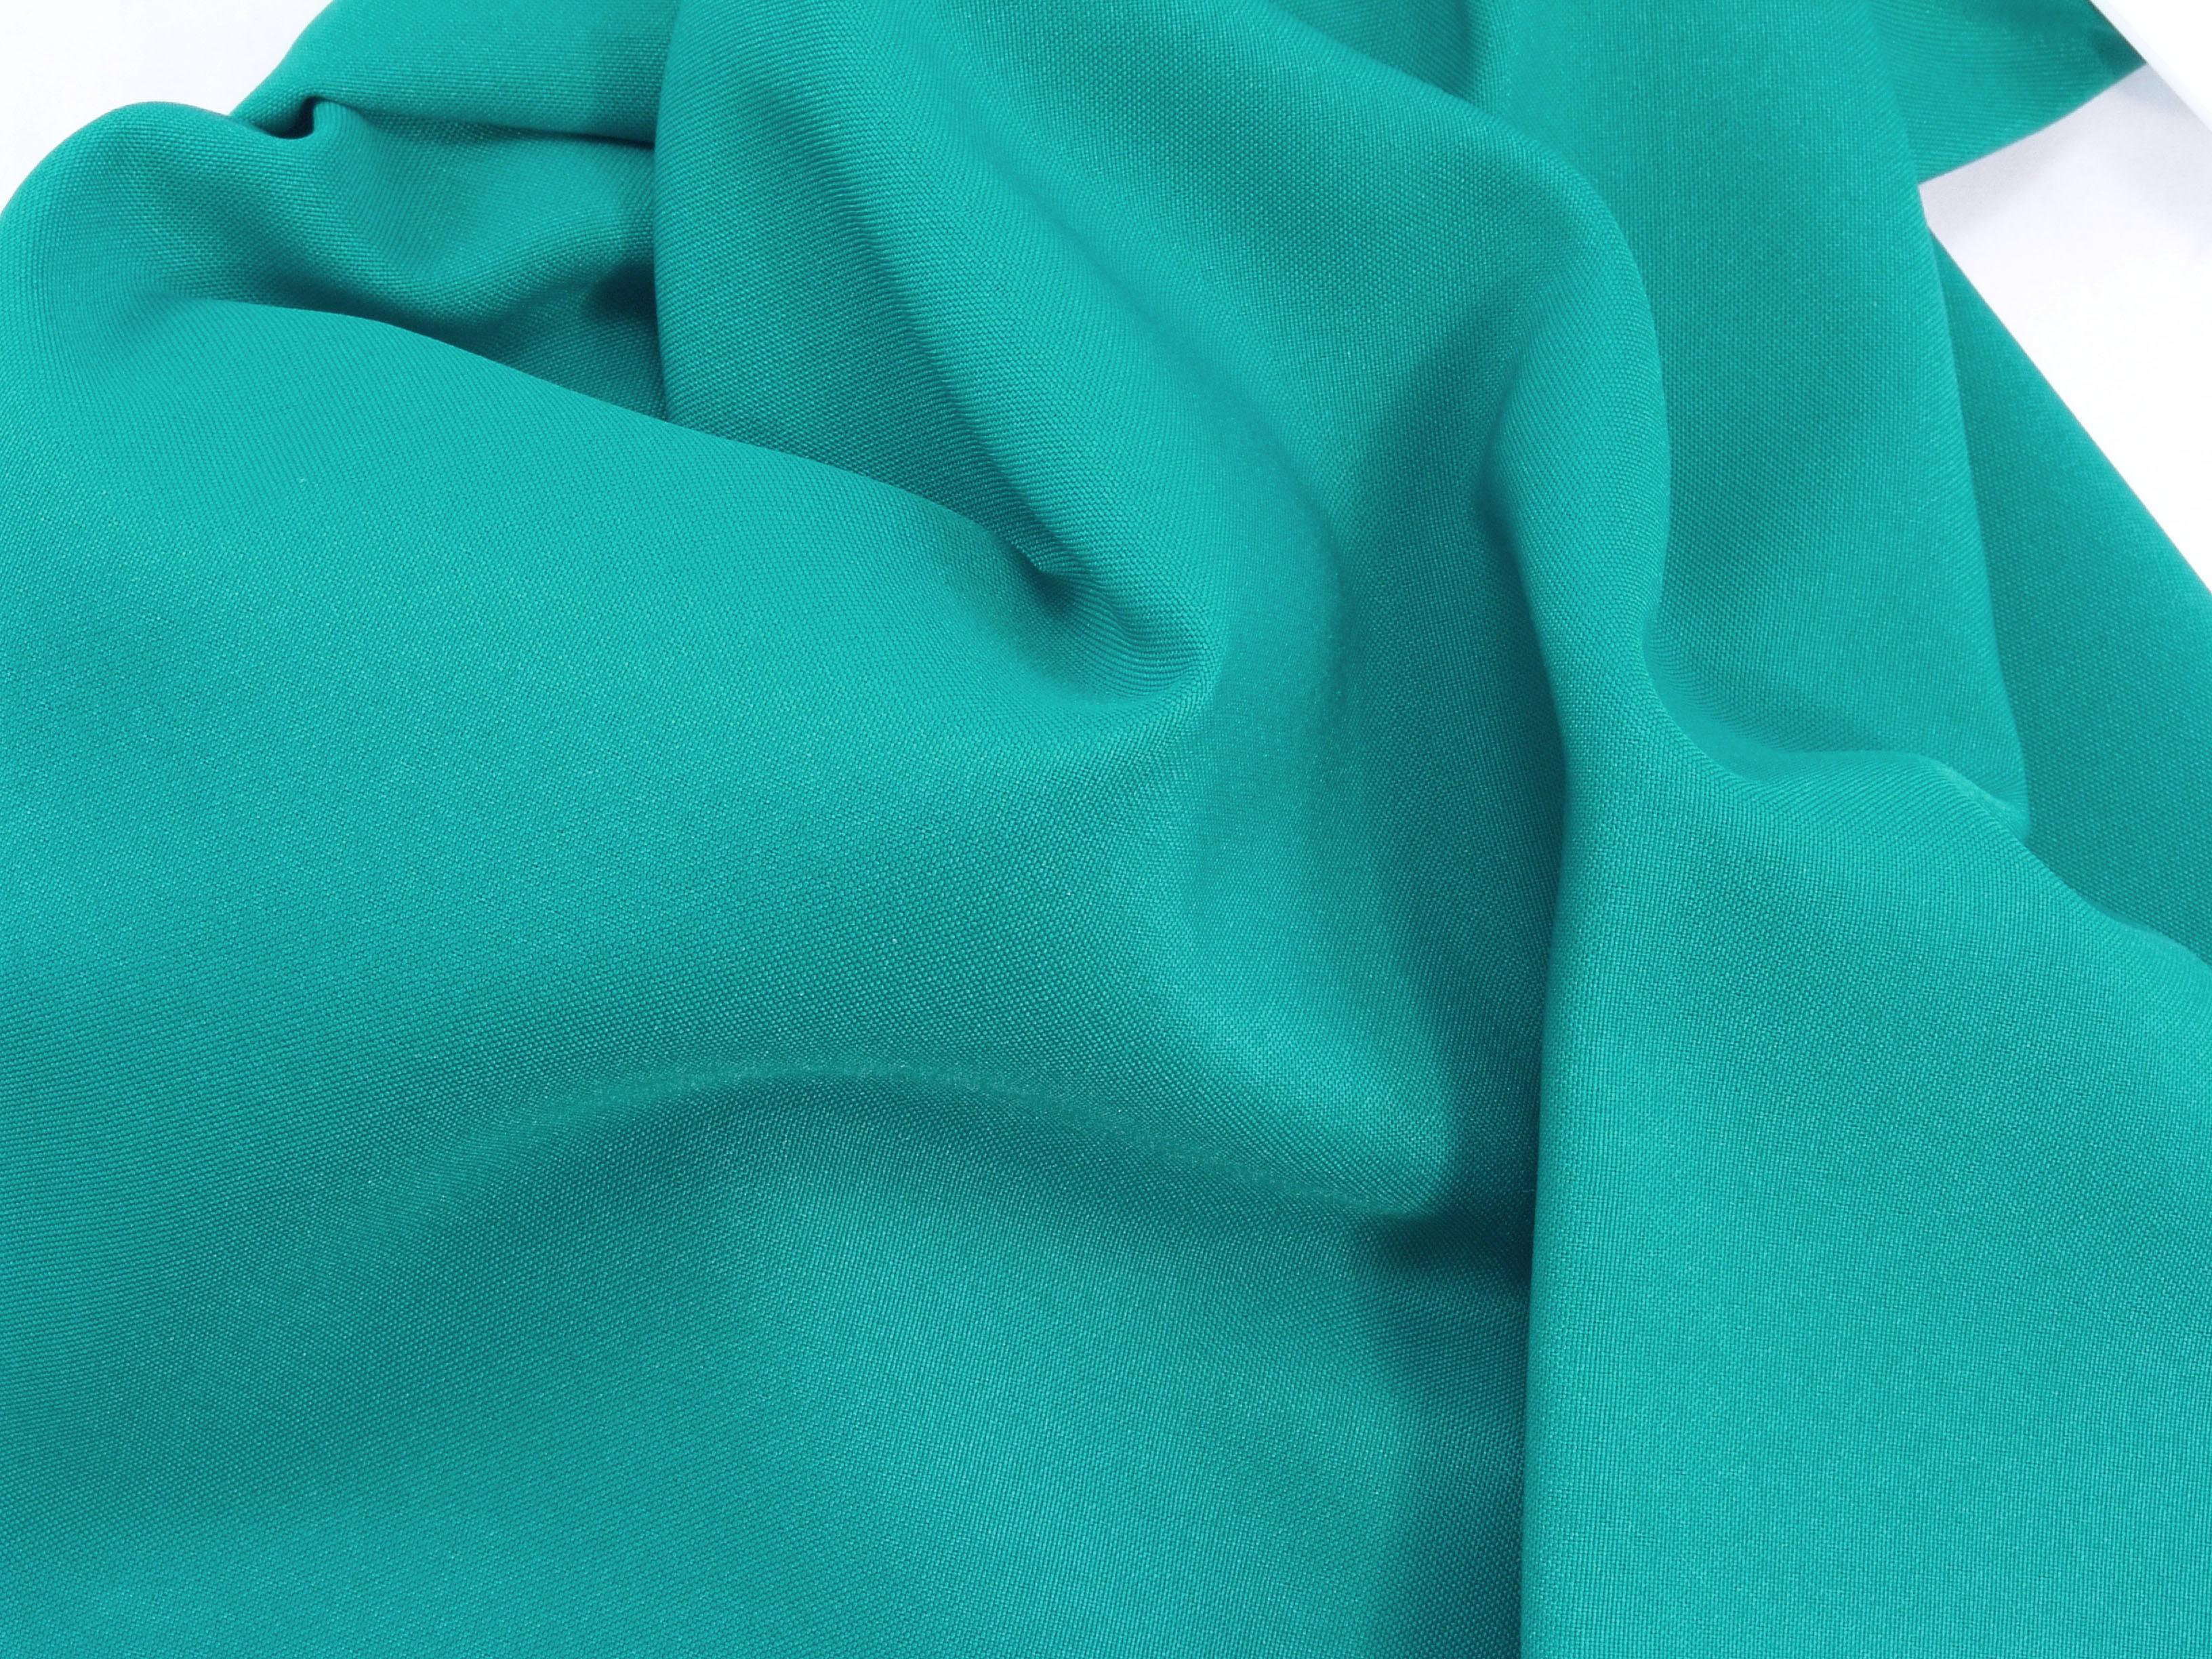 Teal Polyester Sash - CTS45